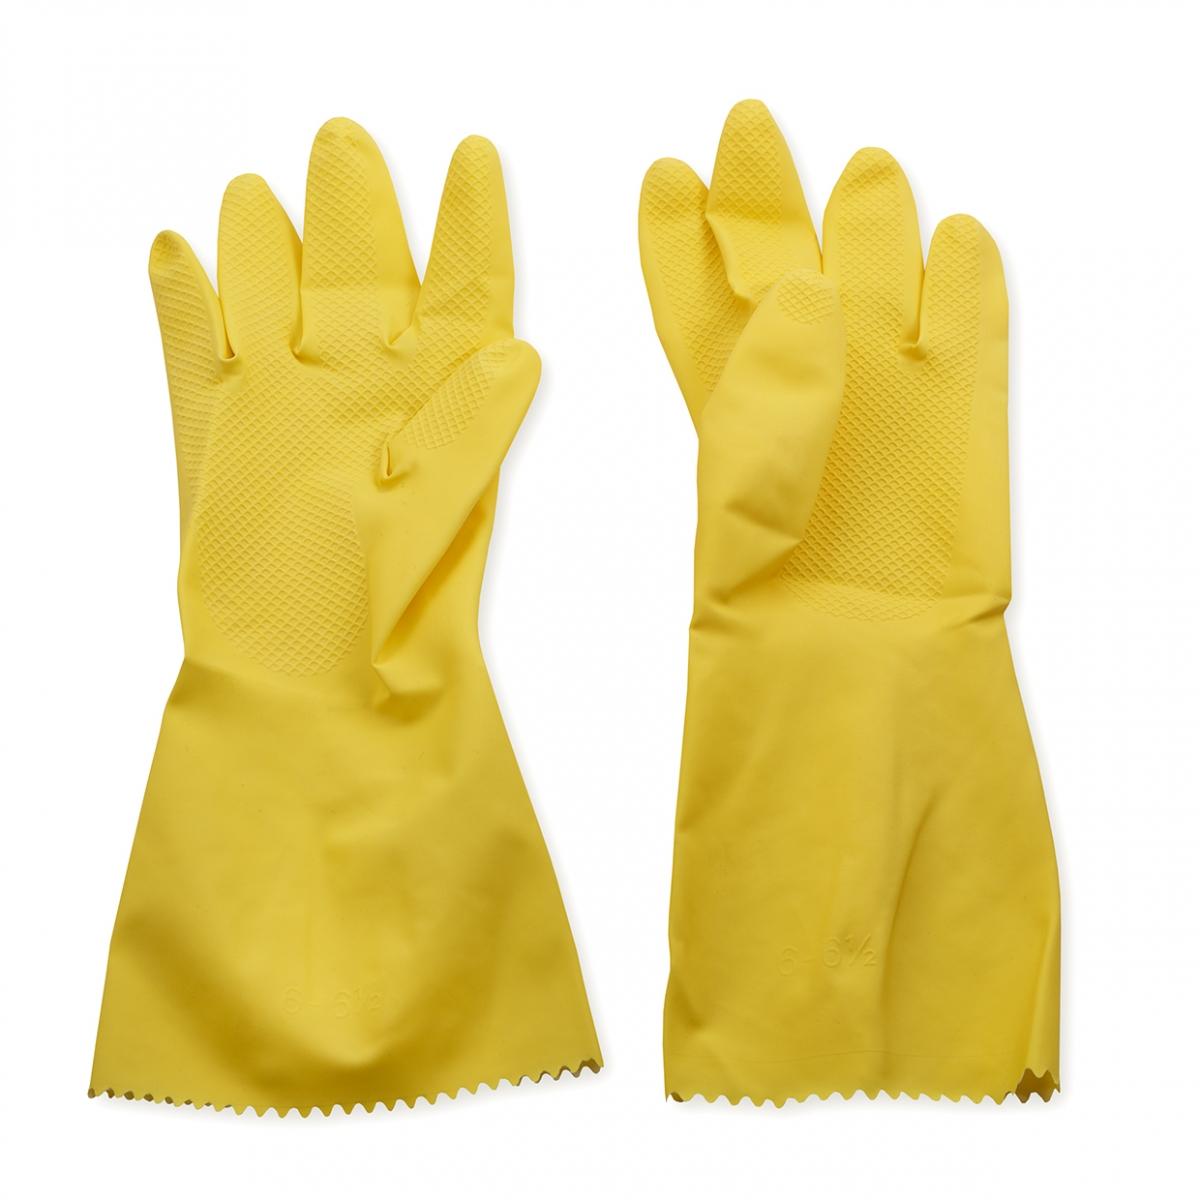 Imagen en la que se ven un par de guantes de limpieza